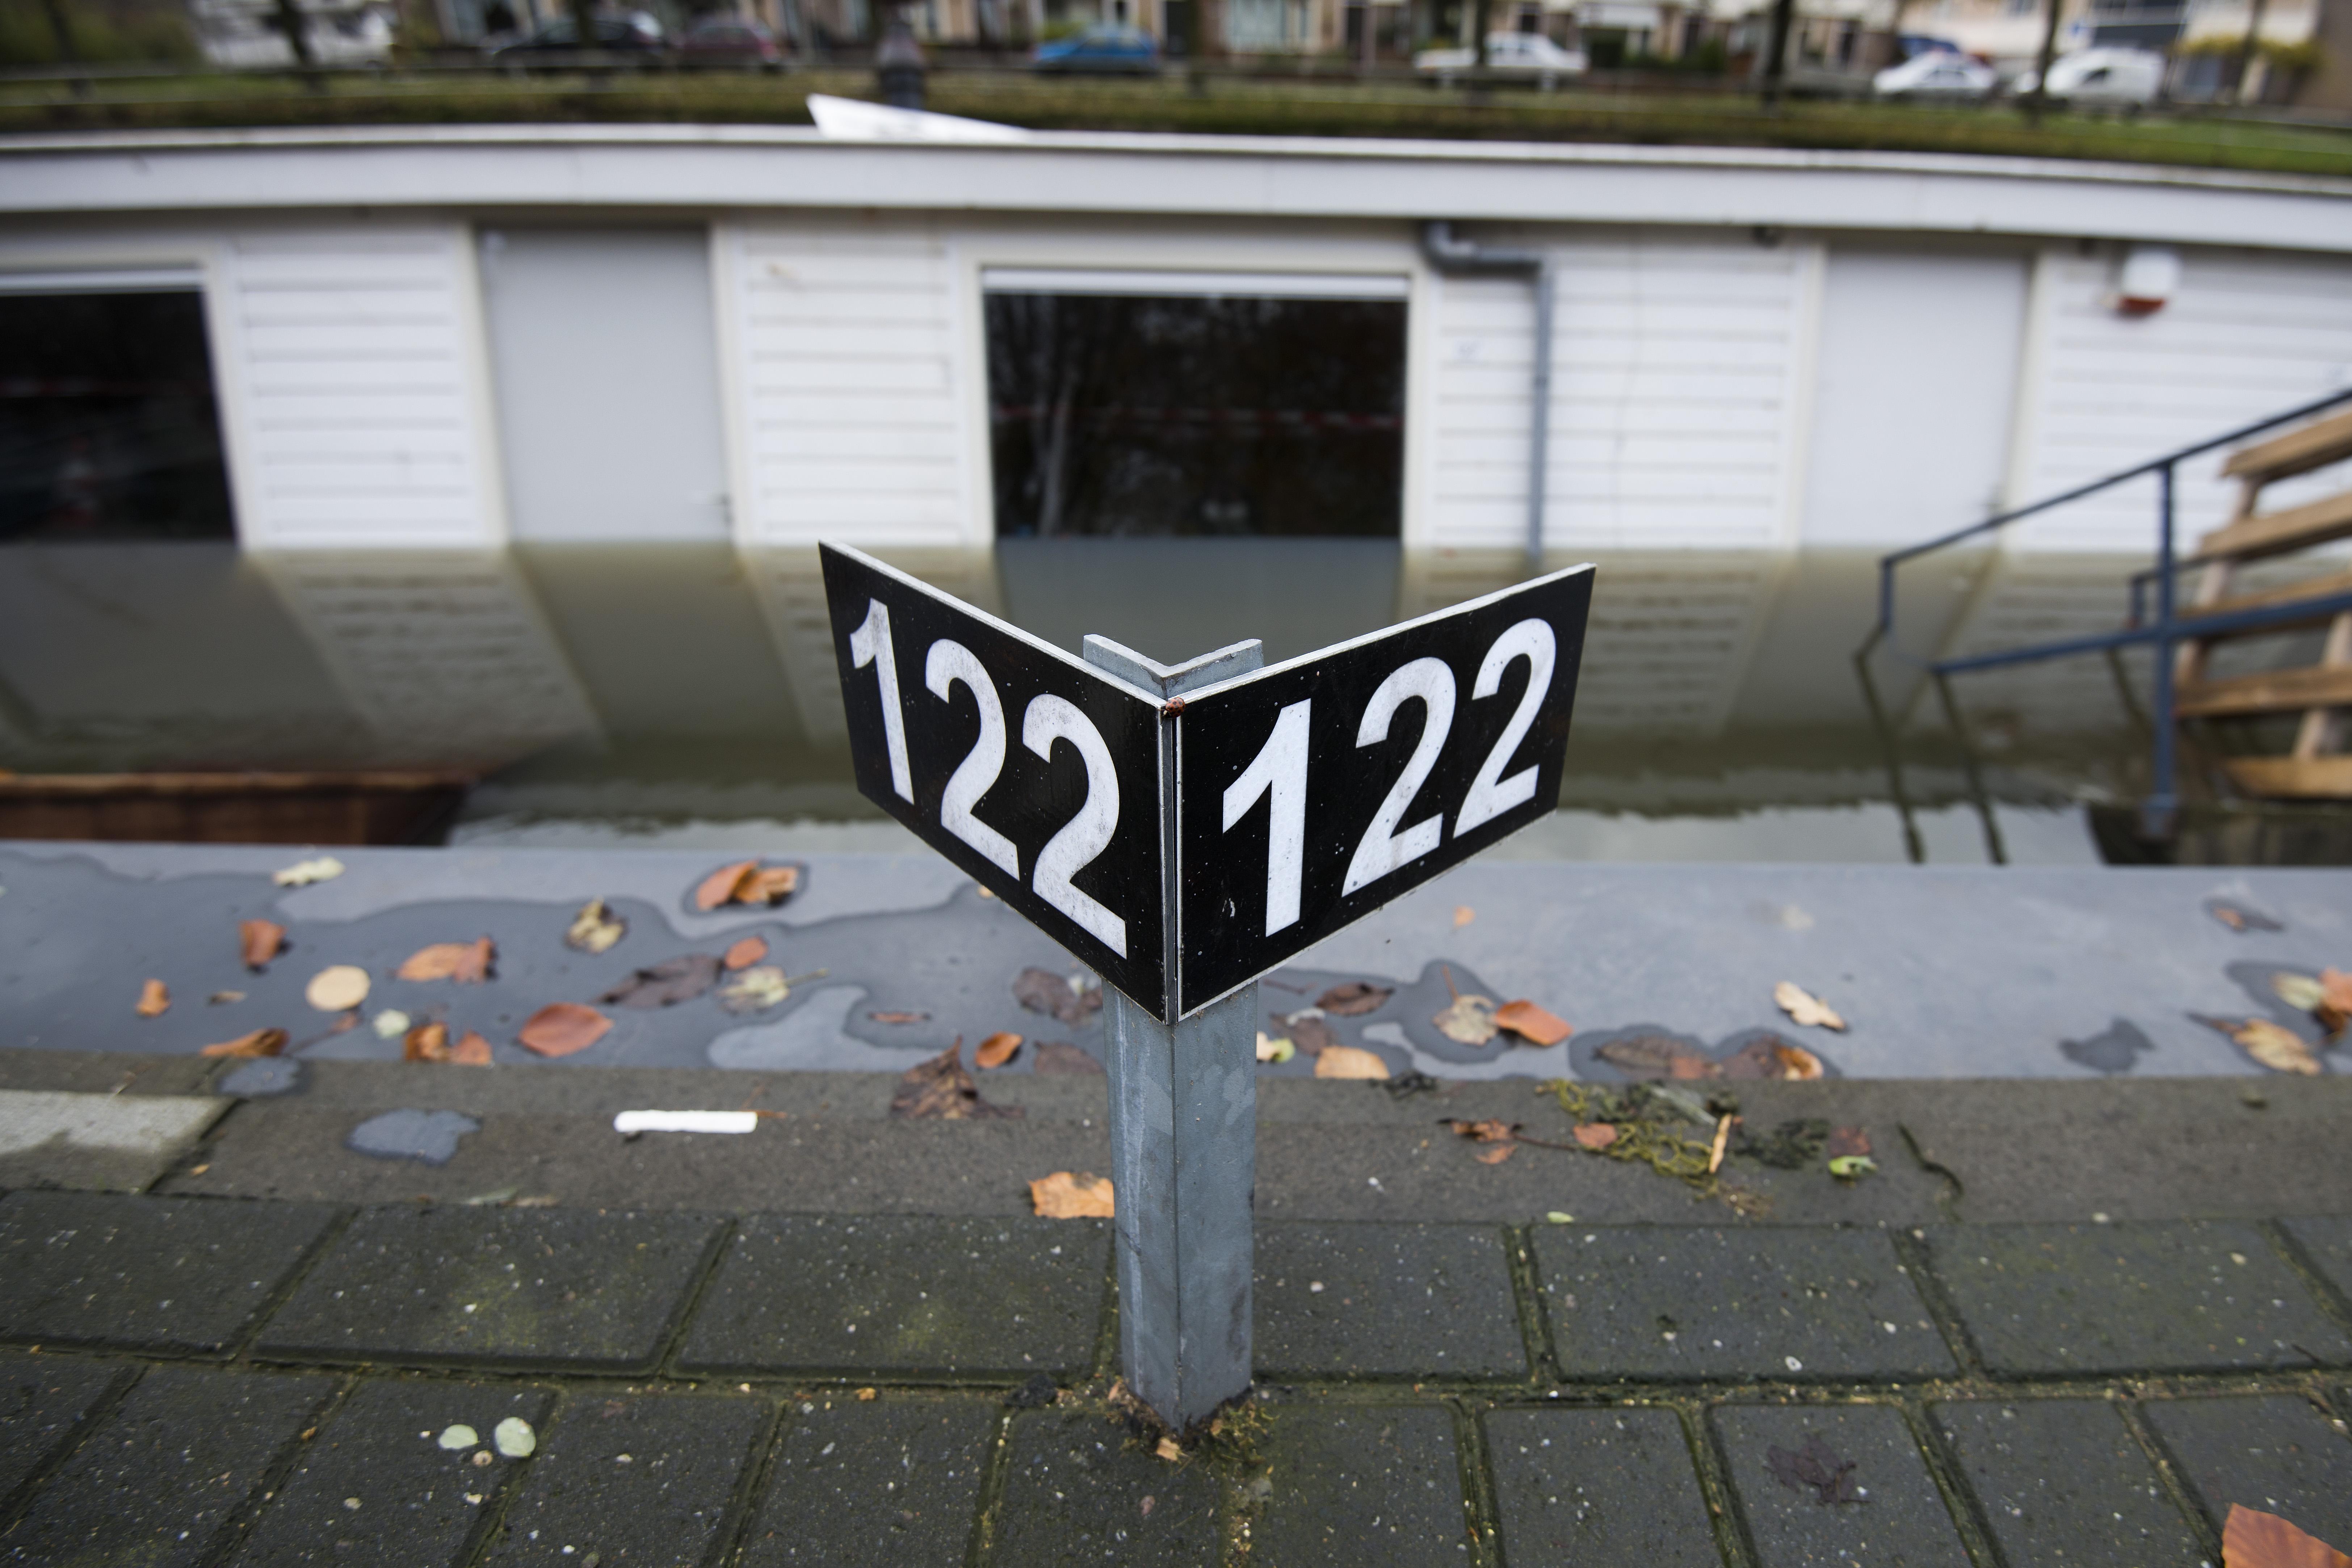 boot 122